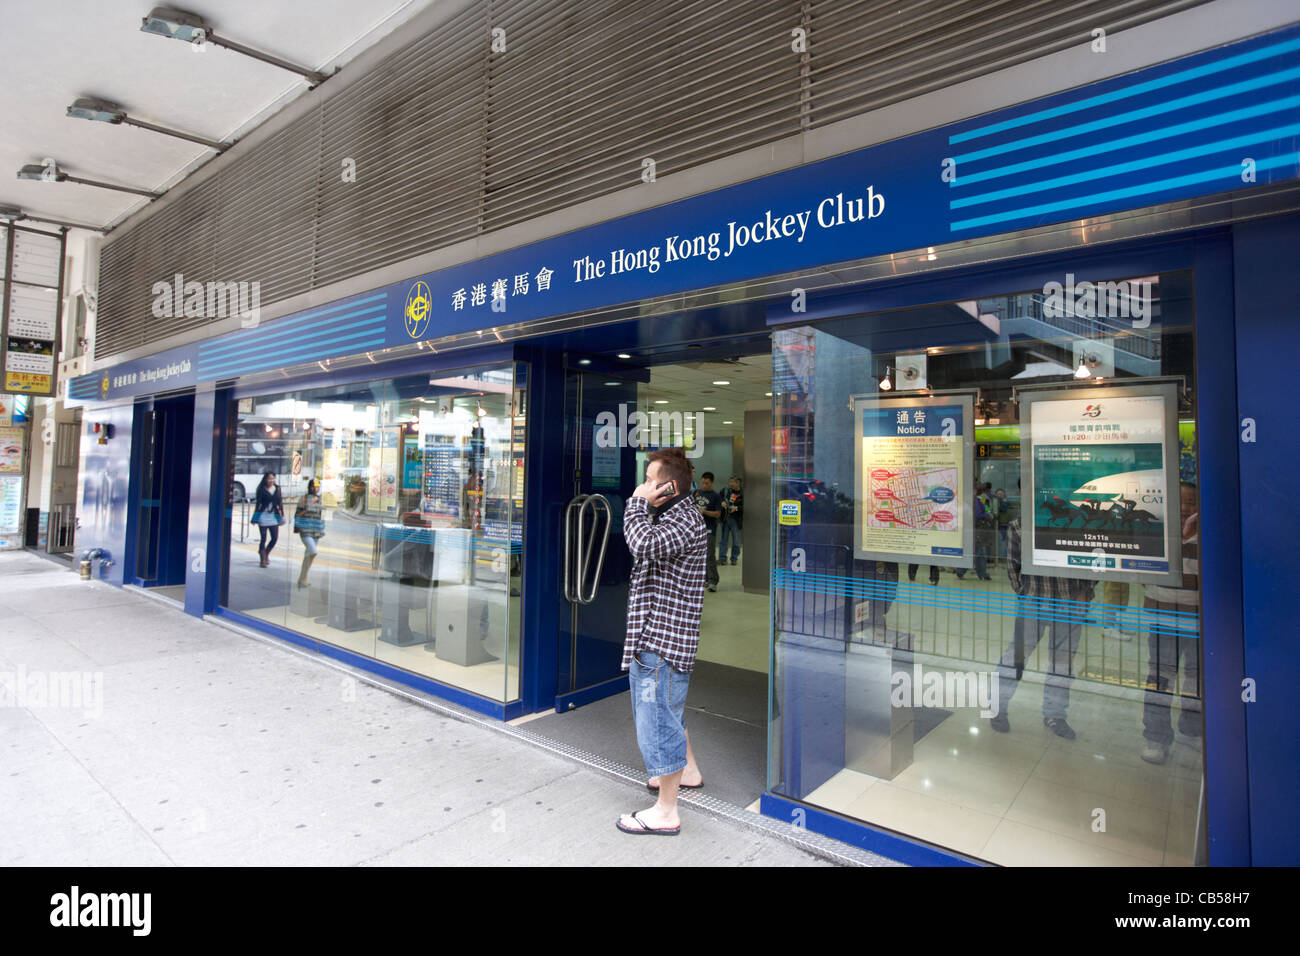 Hong kong jockey club betting locations karambit csgo lounge betting